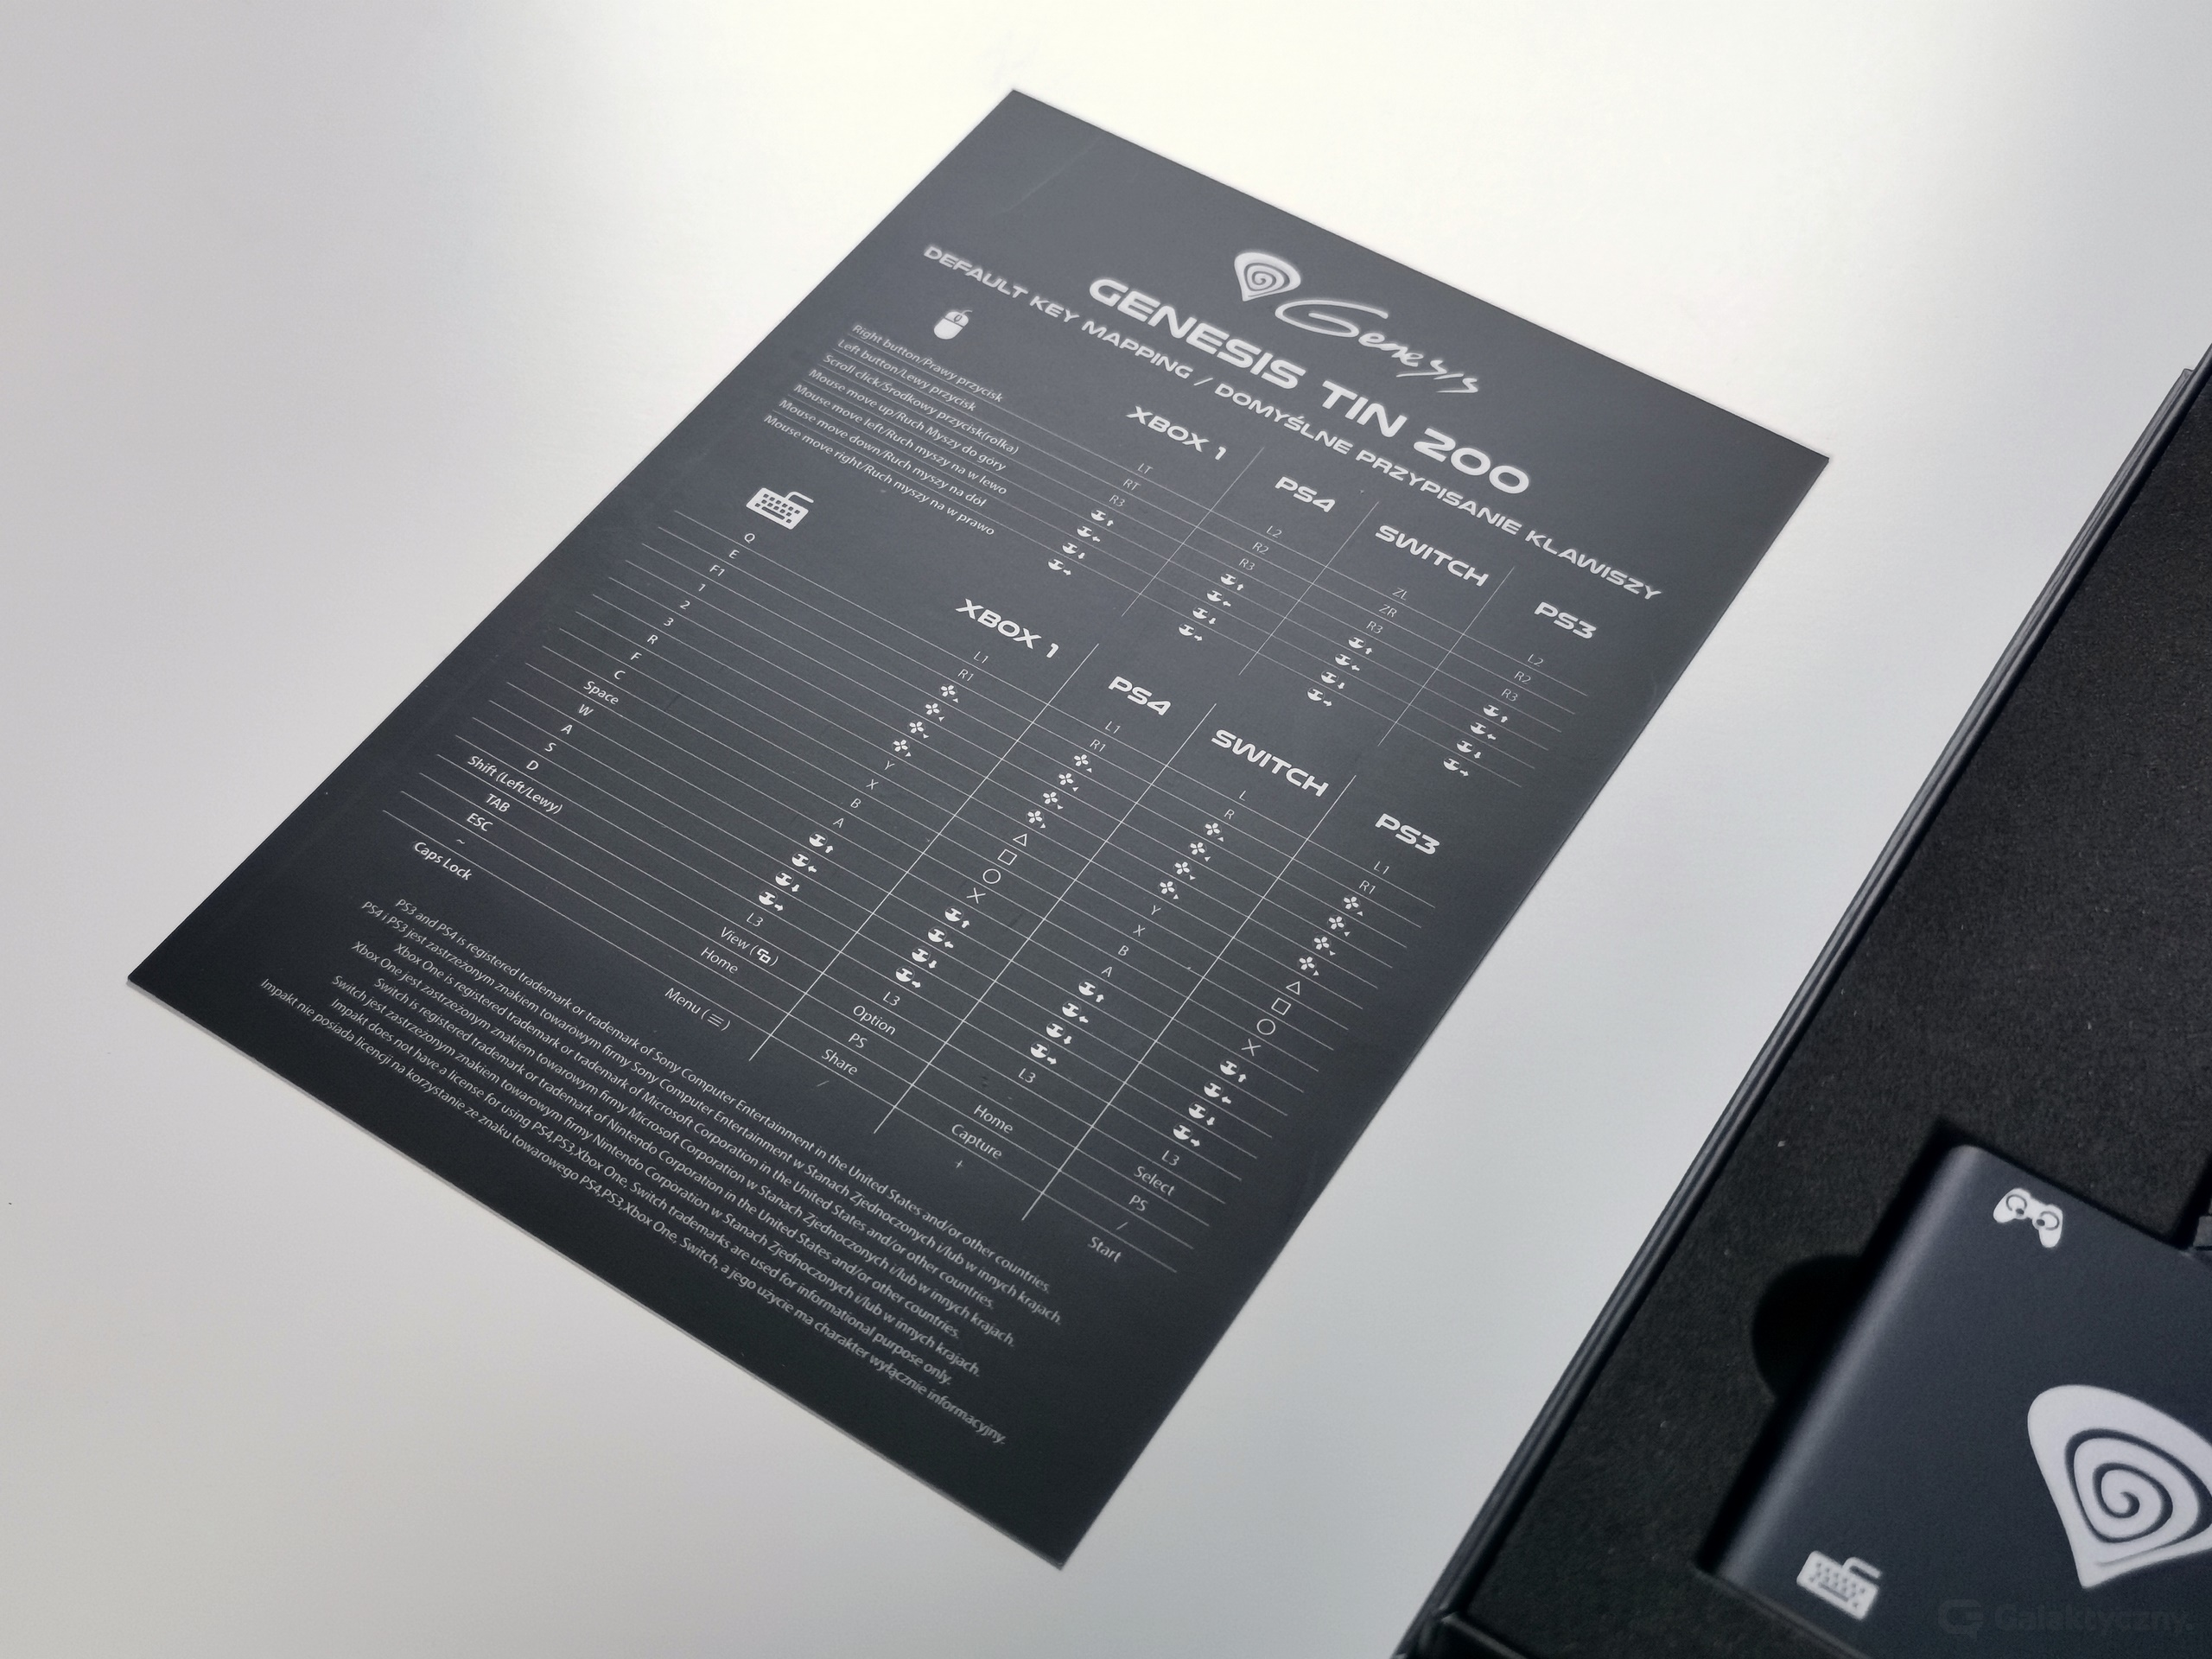 Genesis Tin 200